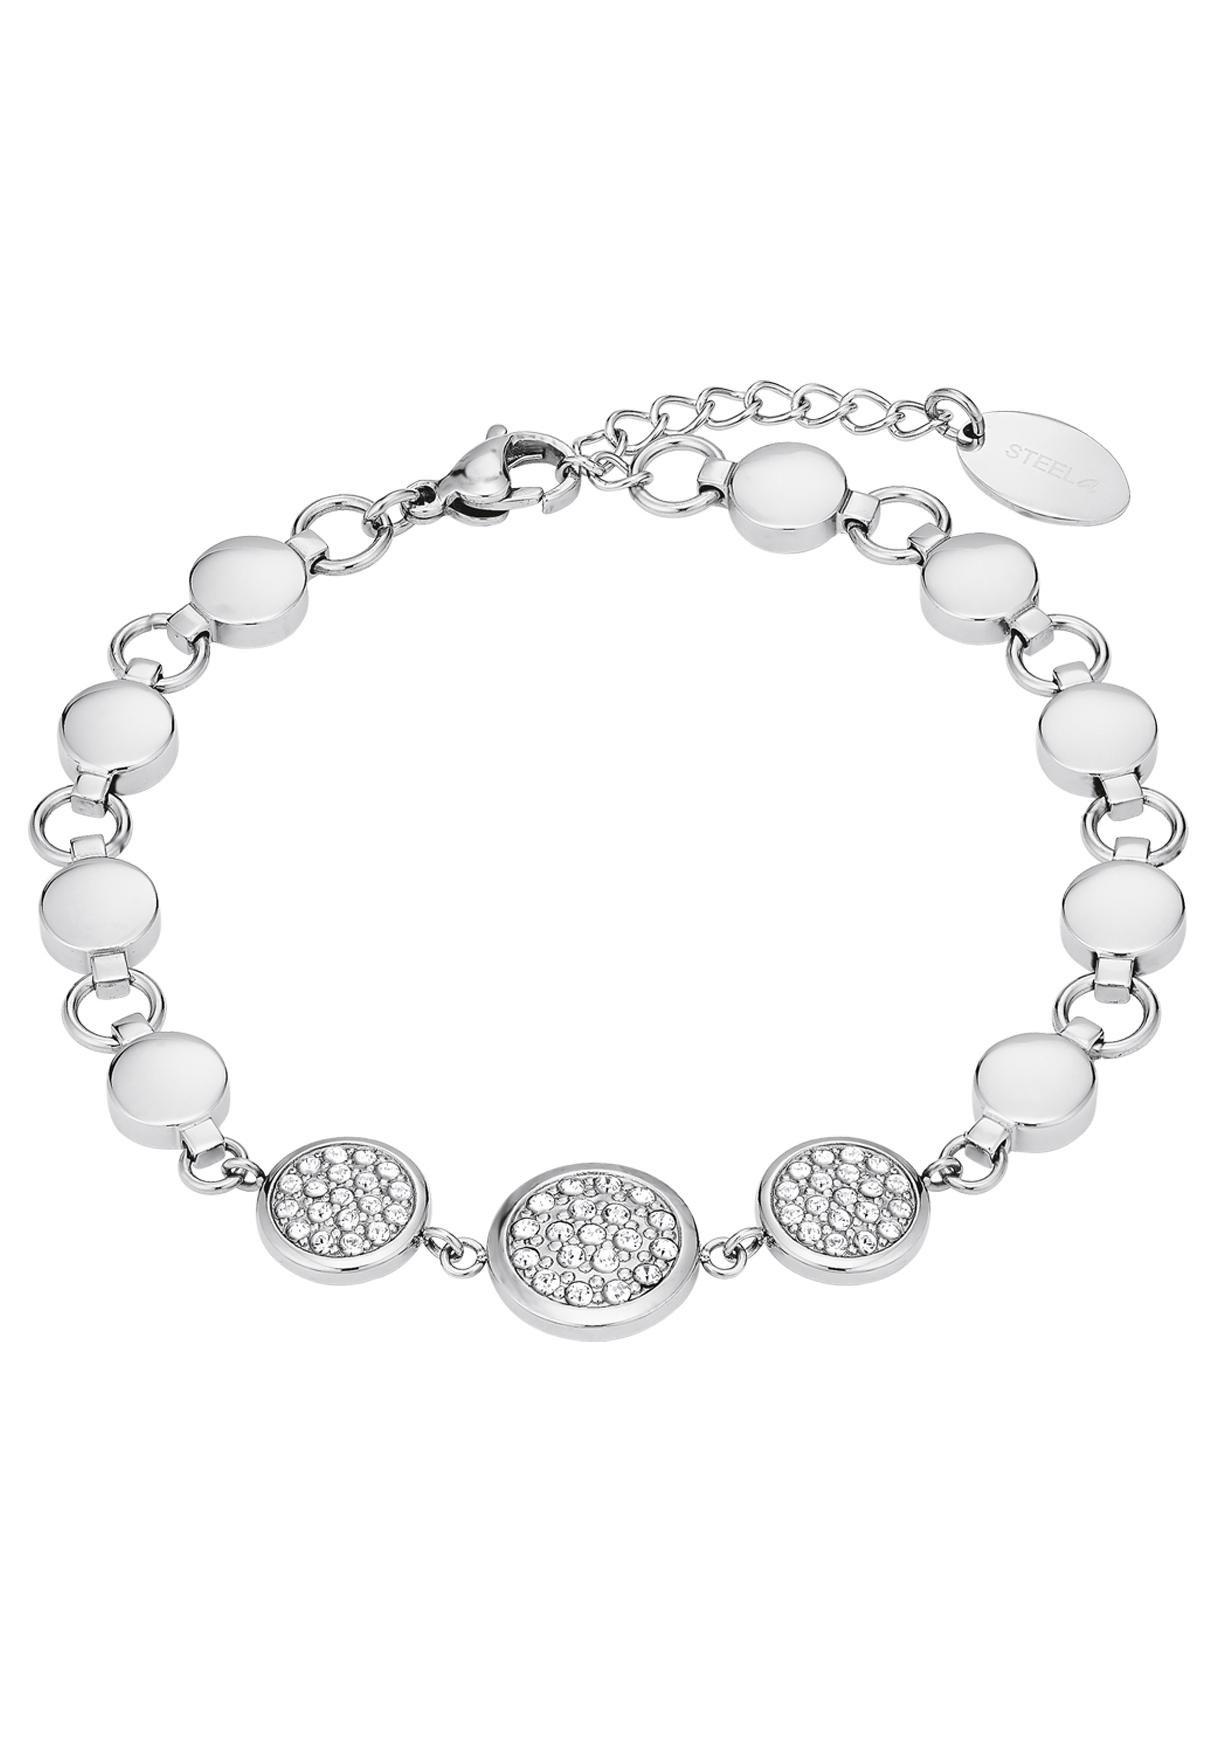 s.Oliver RED LABEL s.Oliver armband »Hoofdcollectie, 2026174« bij OTTO online kopen